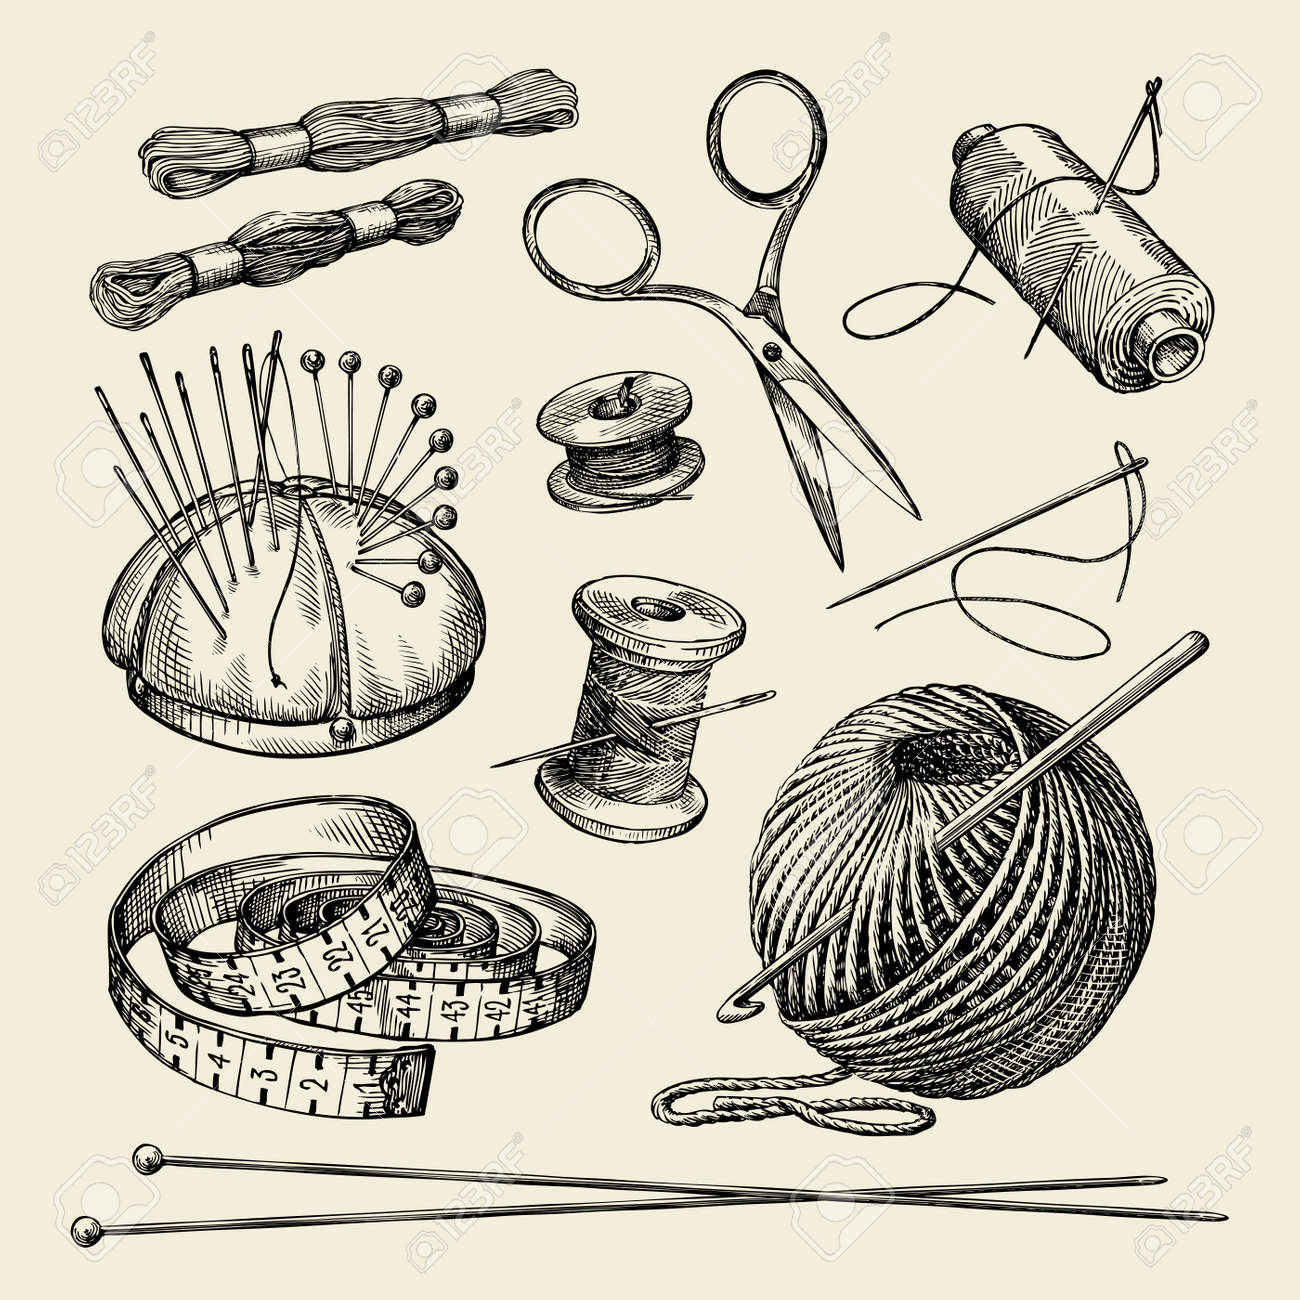 Sewing notions. Hand-drawn thread, needle, scissors, yarn, knitting needles crochet Vector illustration - 61268323